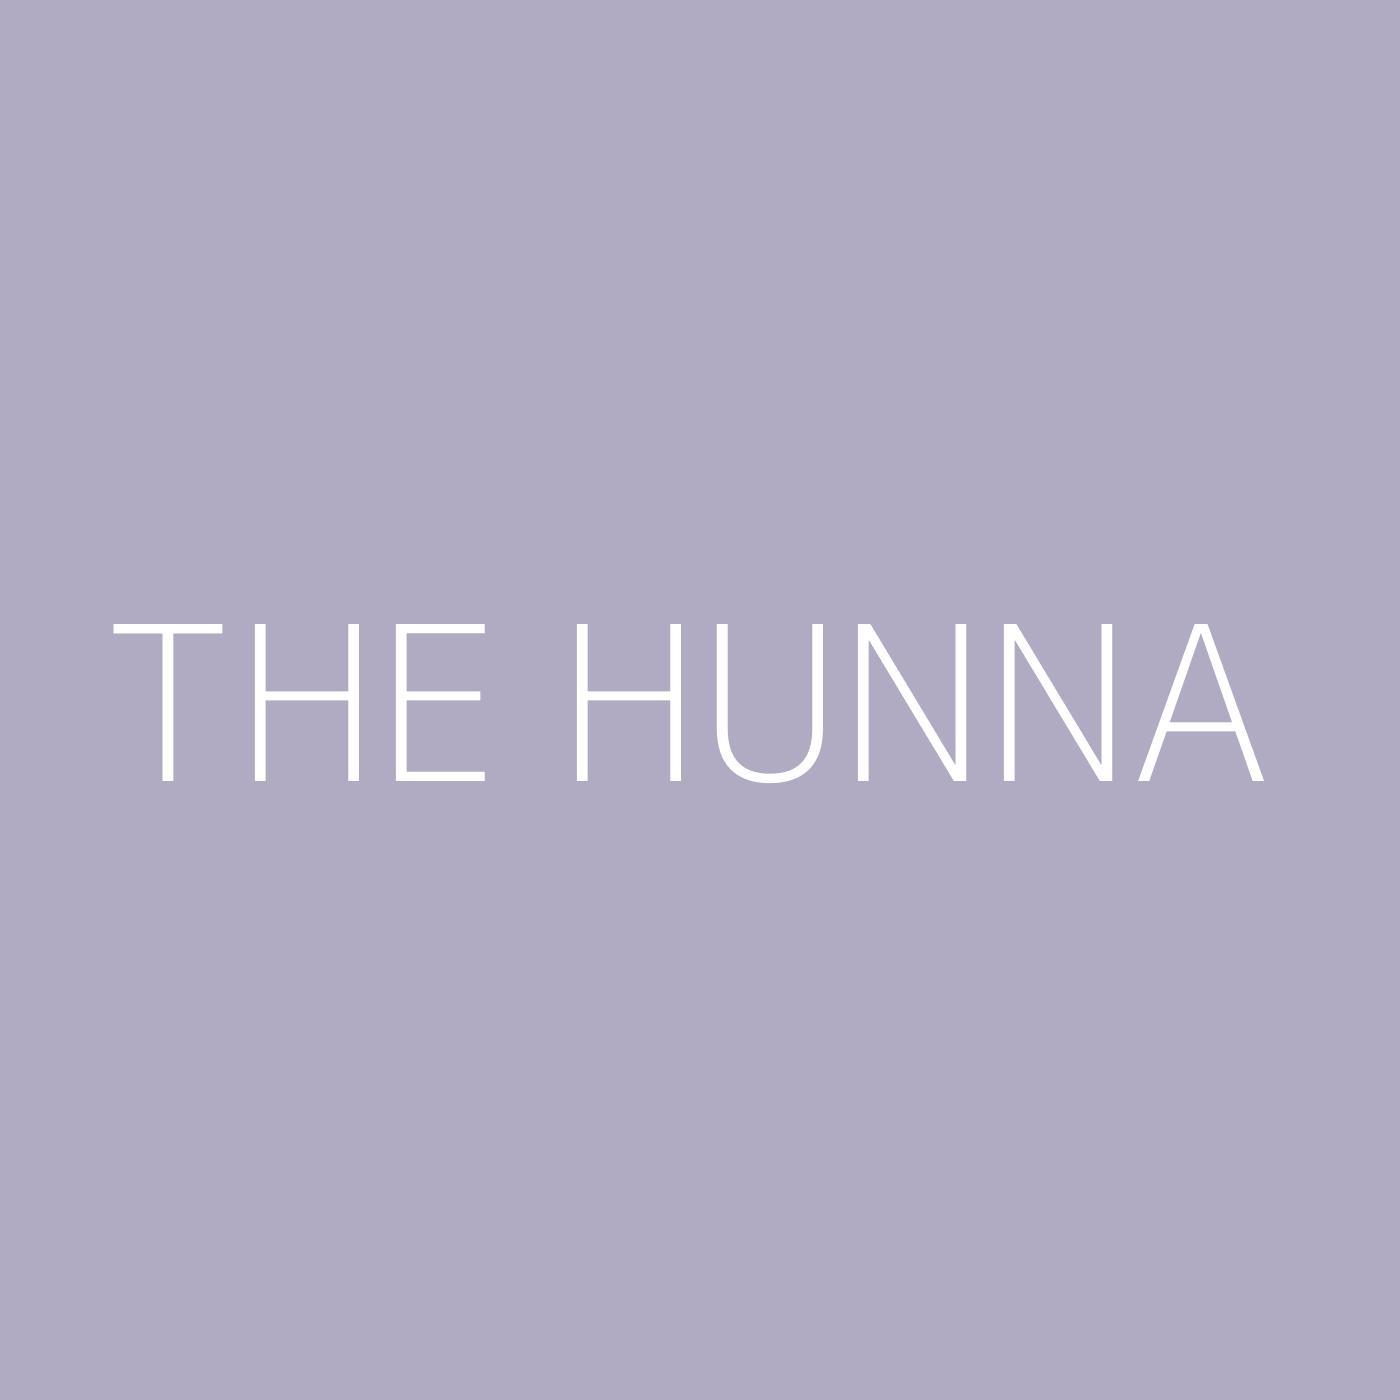 The Hunna Playlist Artwork